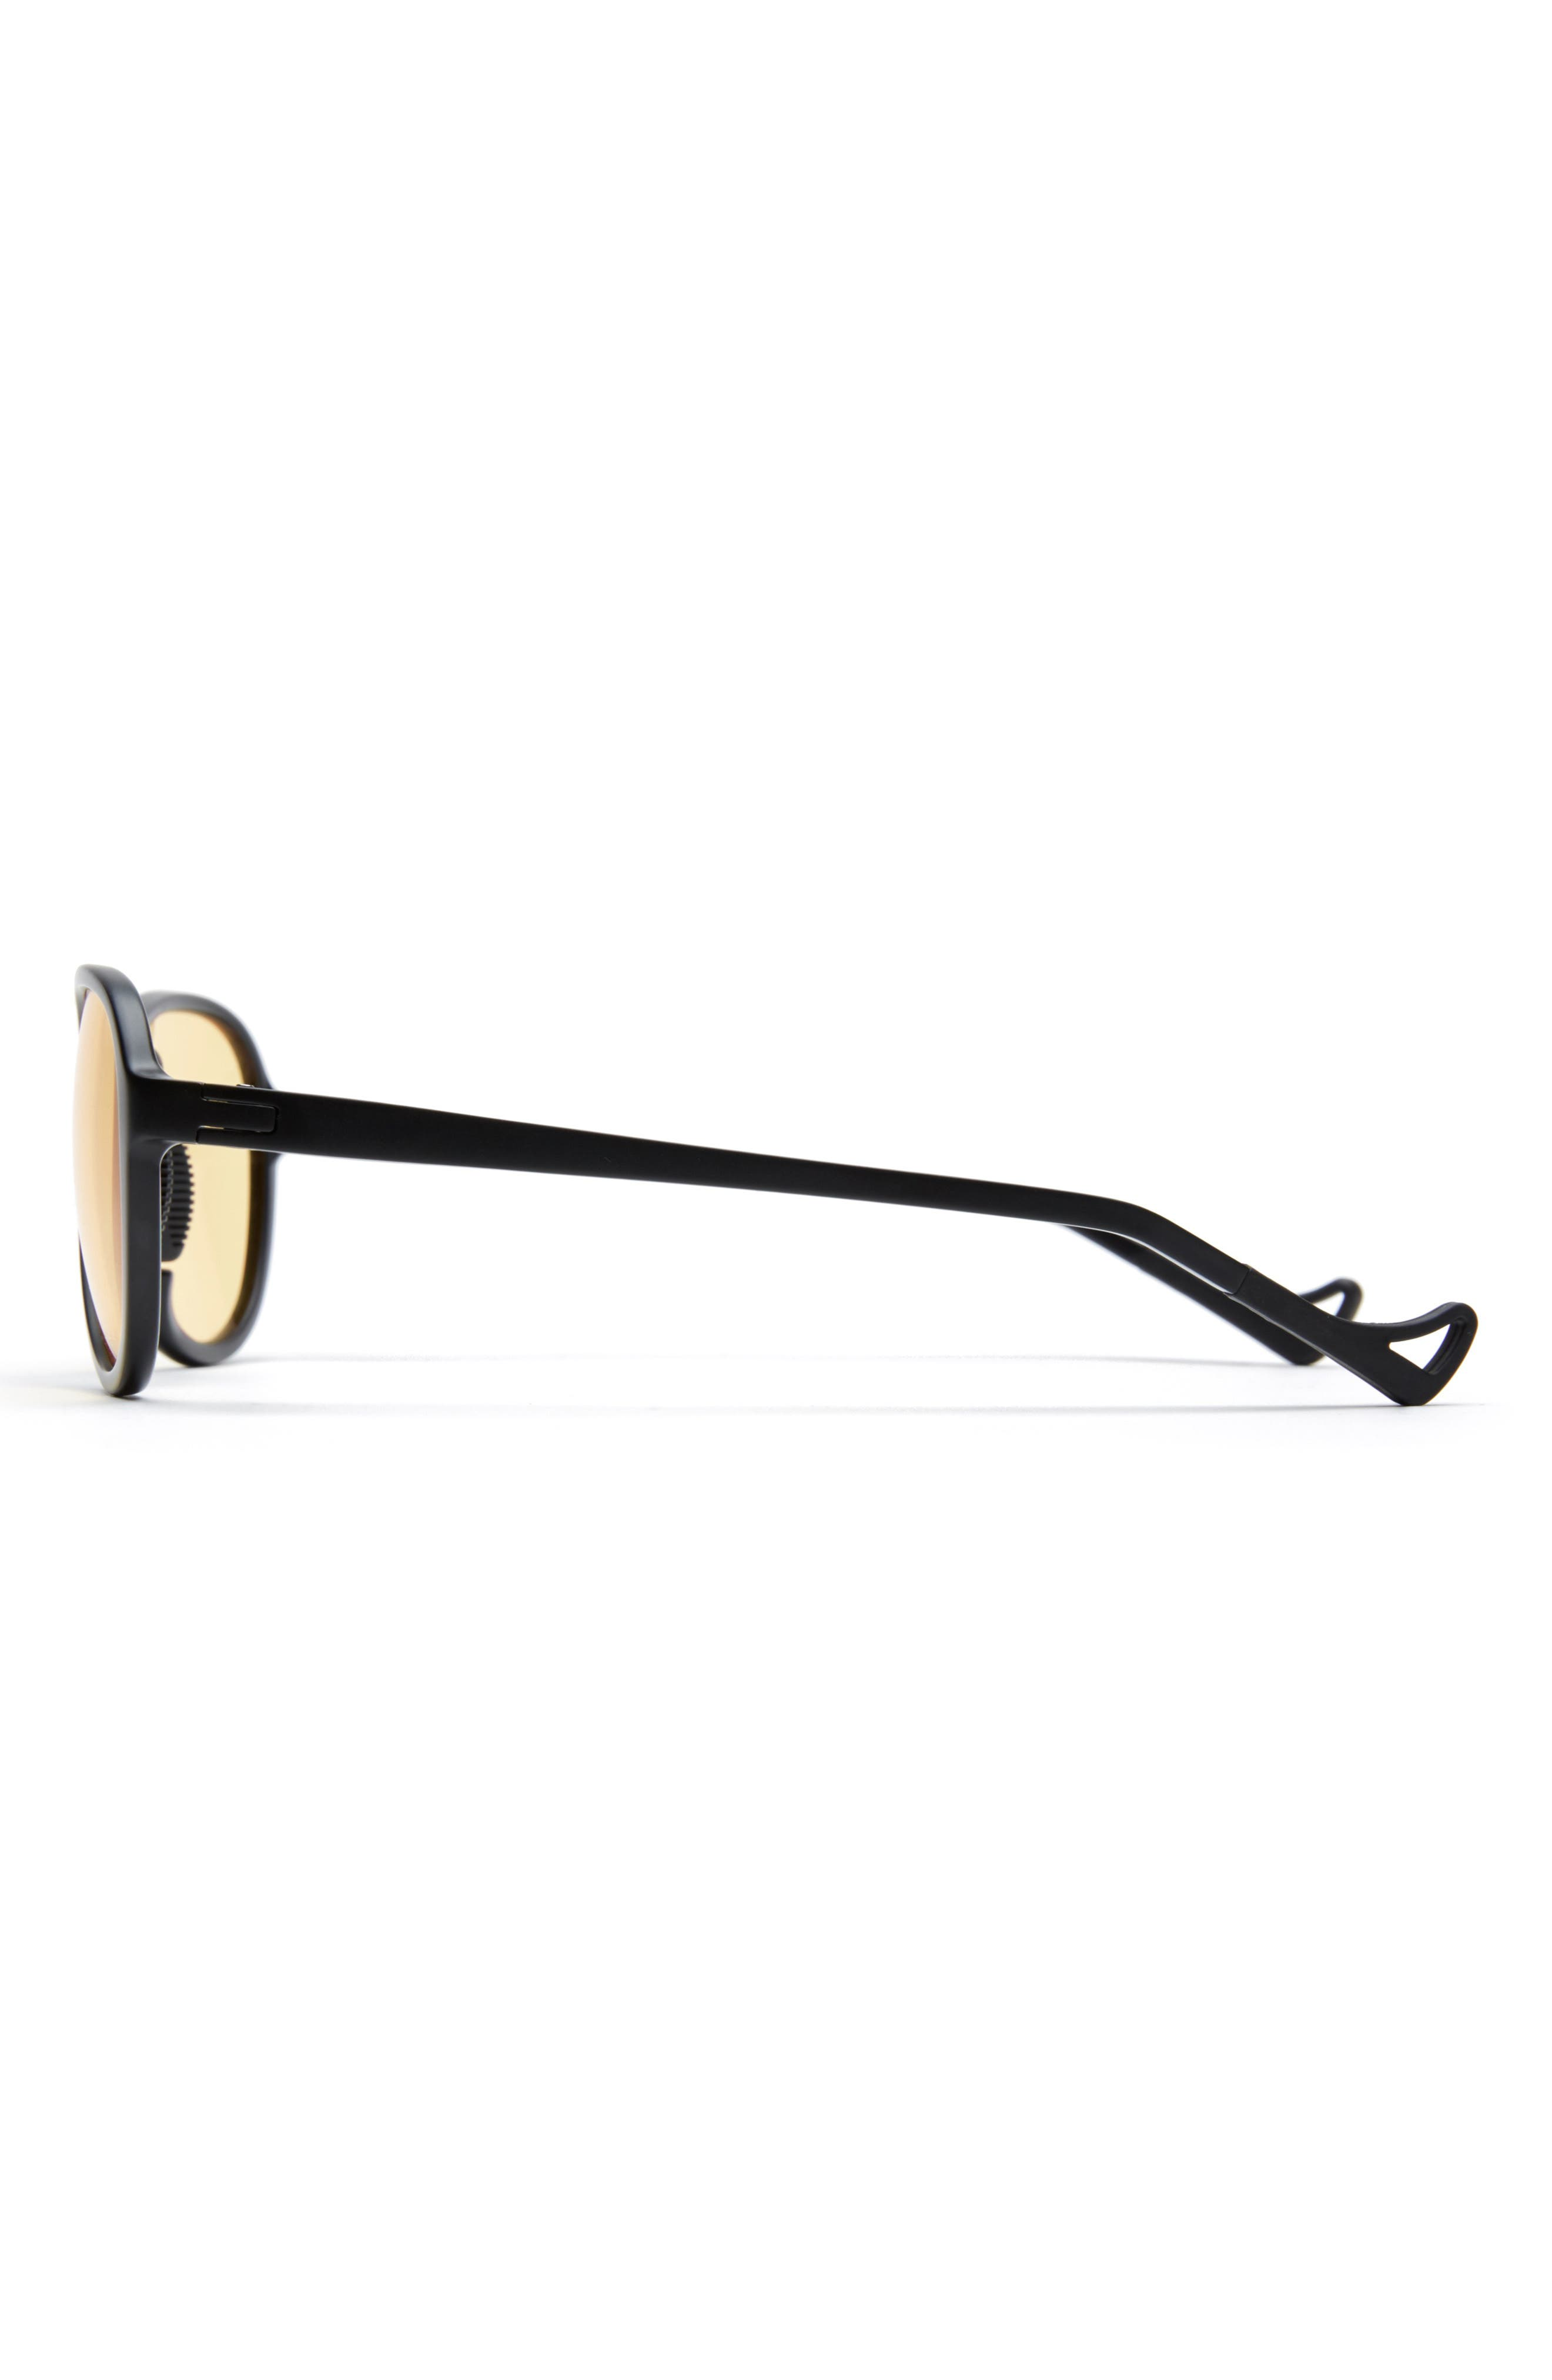 Kaishiro 51mm Sunglasses,                         Main,                         color, BLACK/ YELLOW